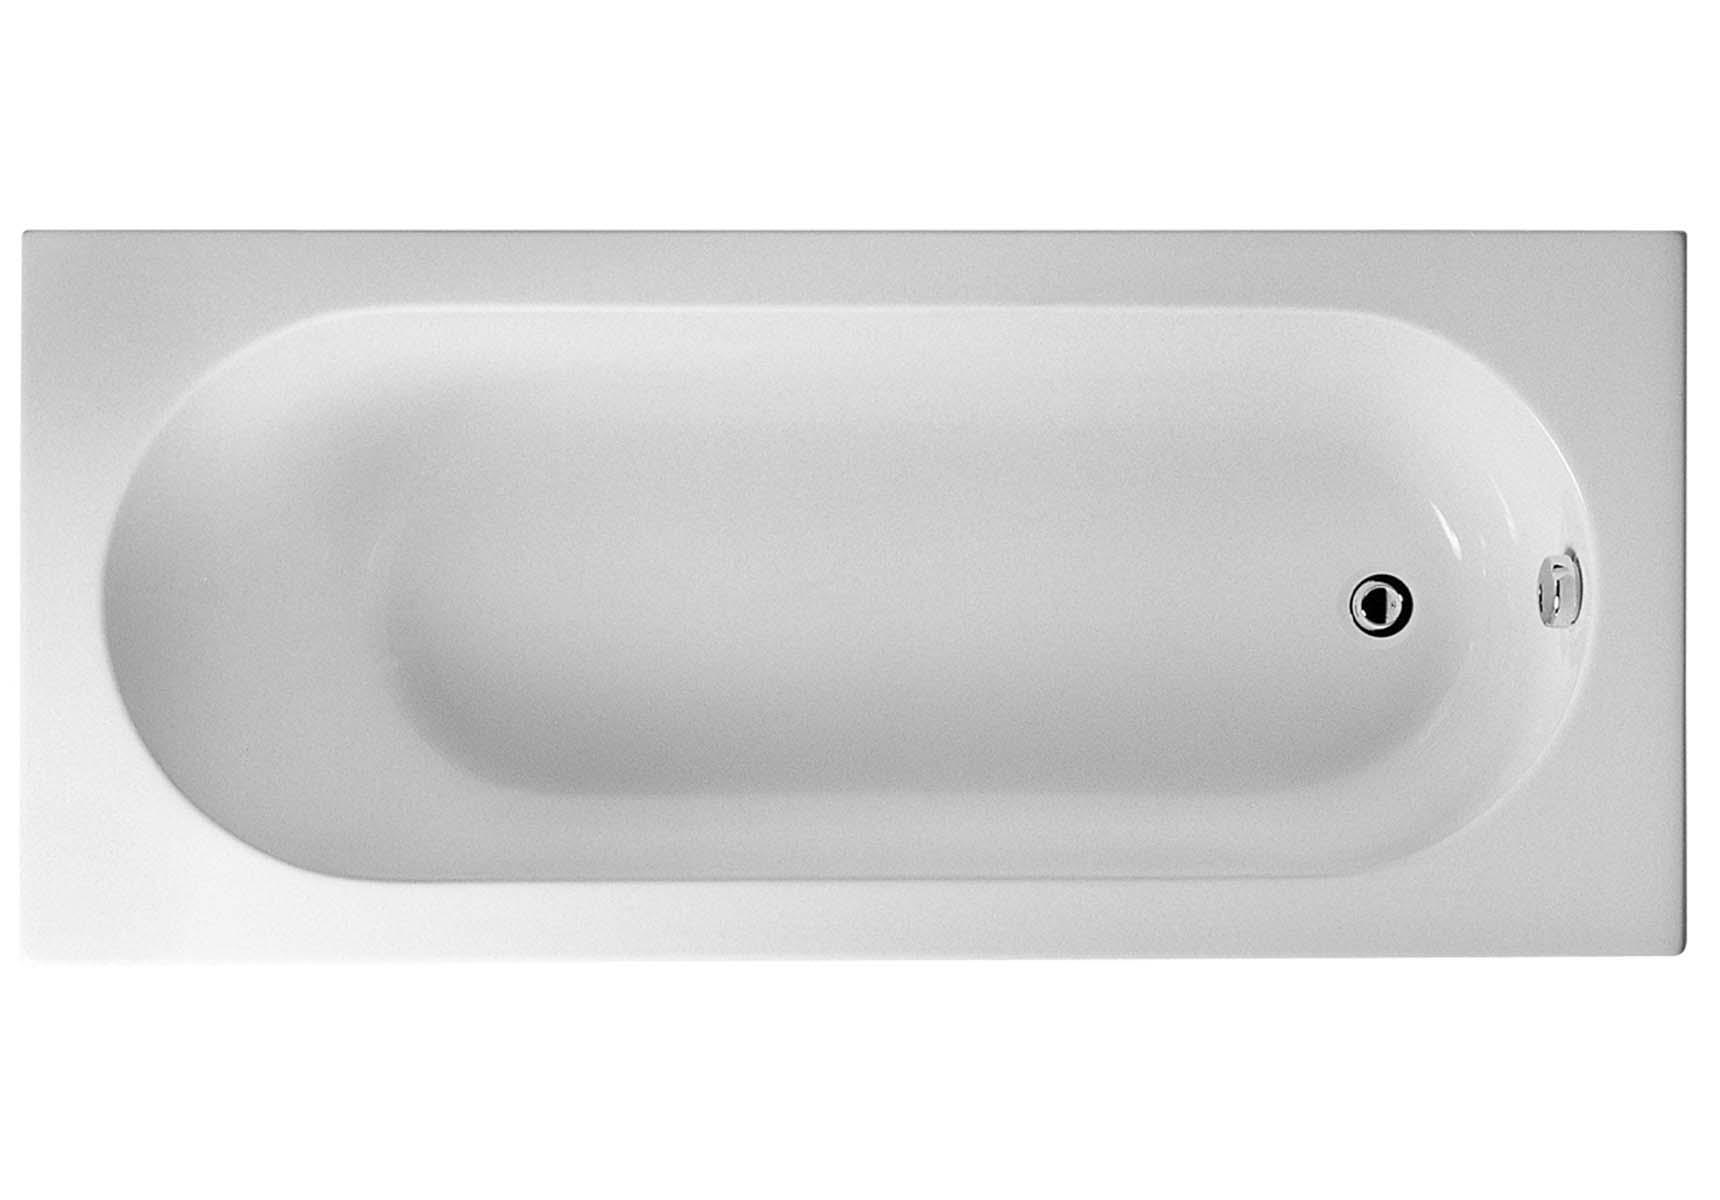 Matrix 170x75 cm Rectangular/Single-Sided Aqua Soft, Double Grip